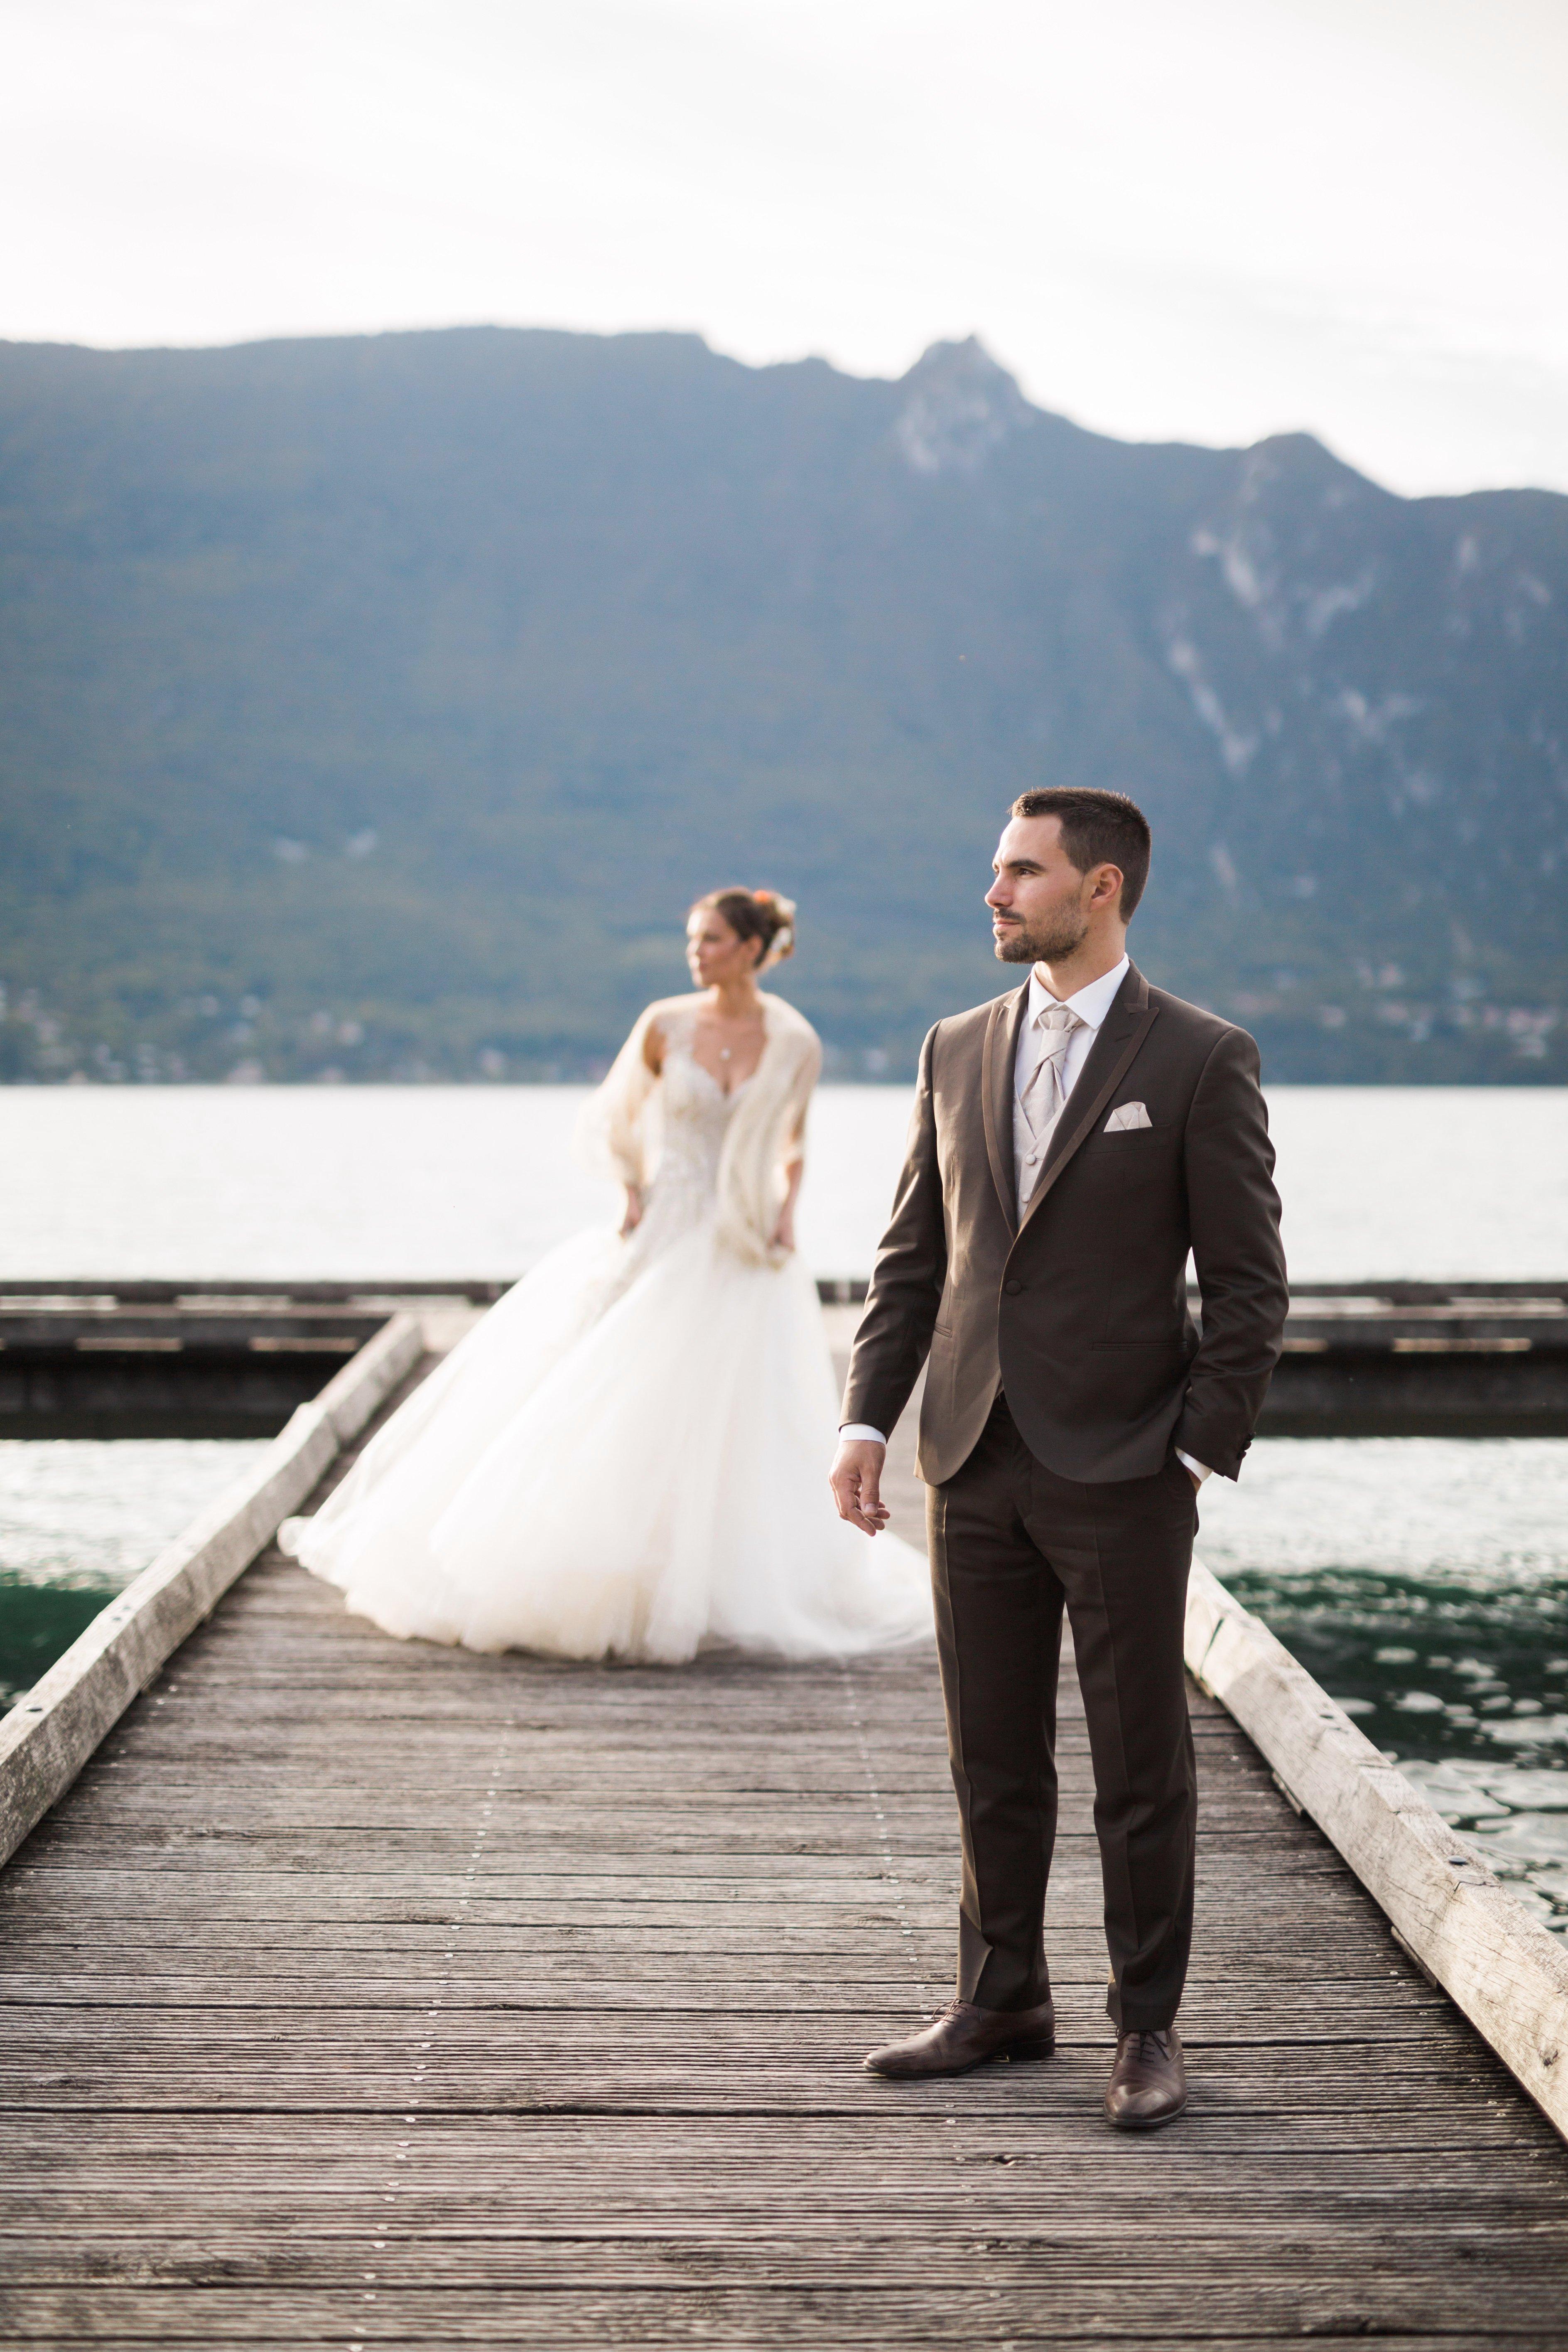 Mariage de Lauriane & Kevin